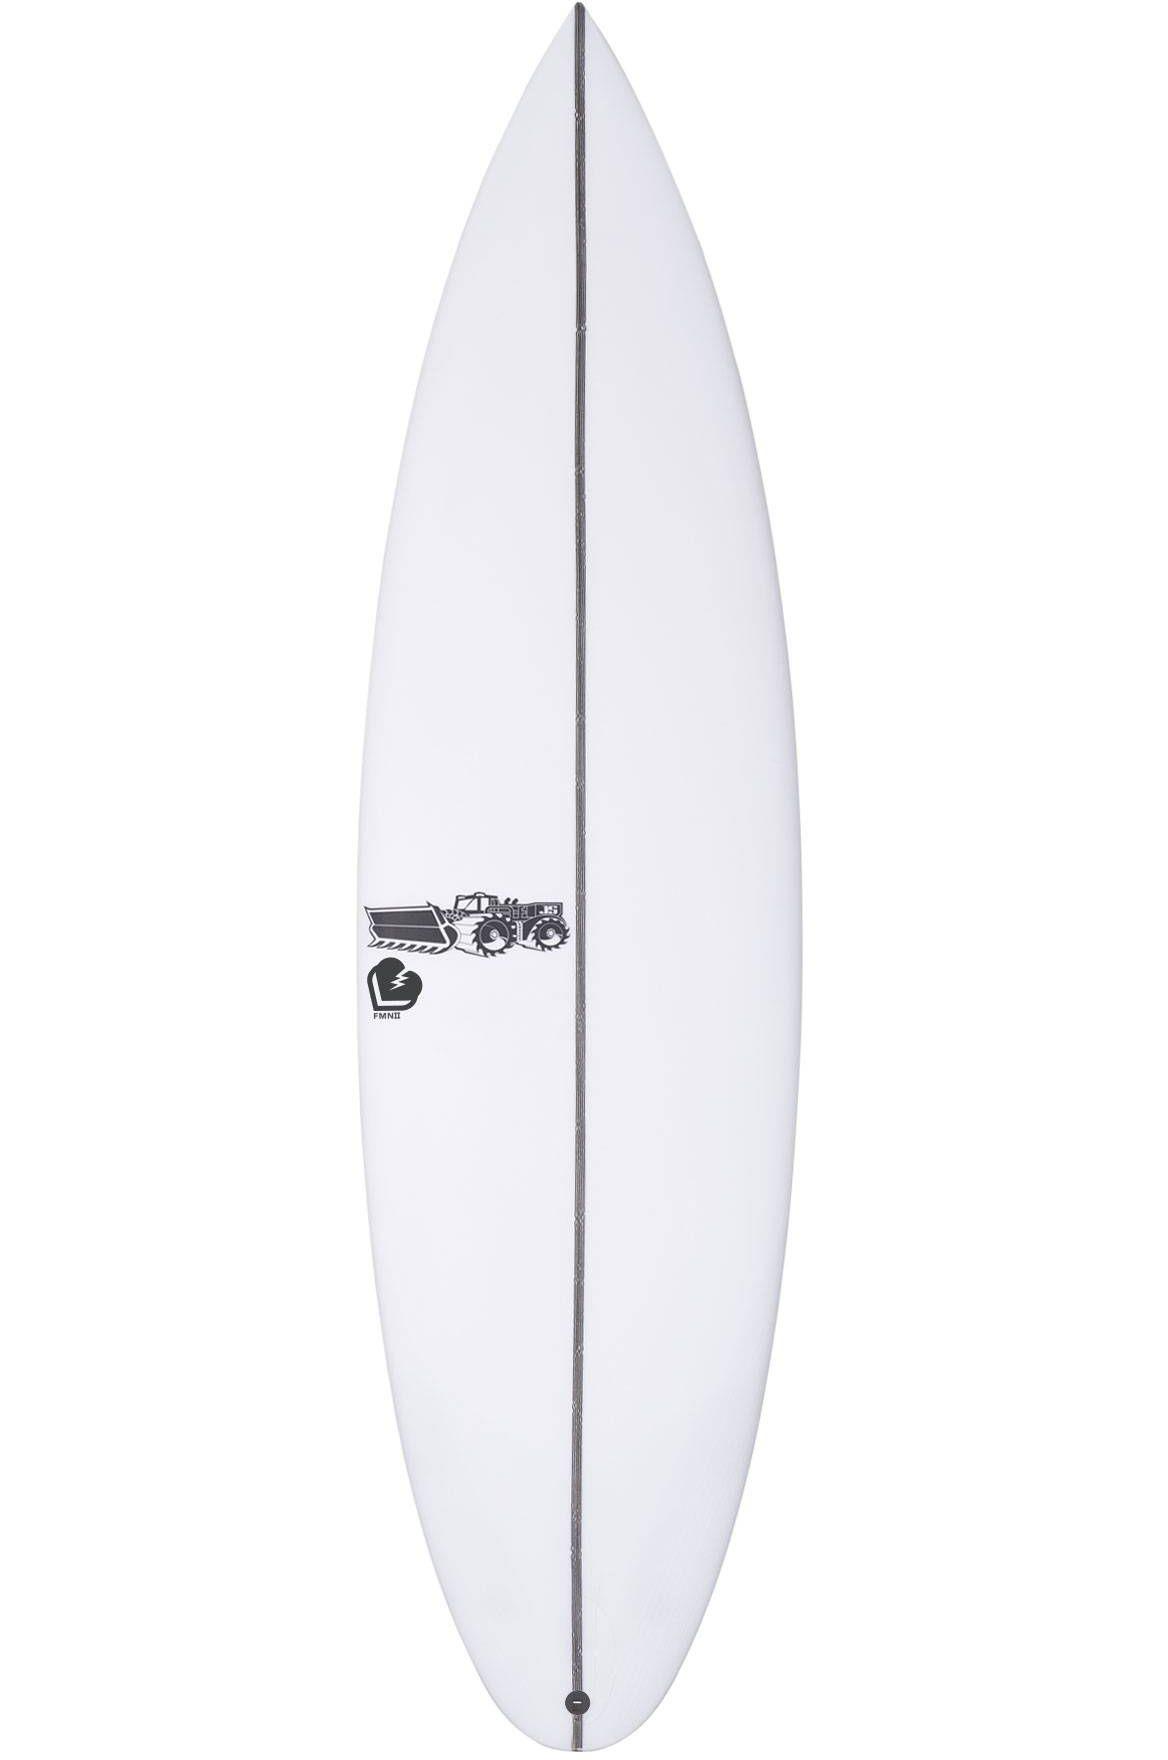 Prancha Surf JS 6'0 FMN 2 Round Pin Tail - White FCS II Multisystem 6ft0